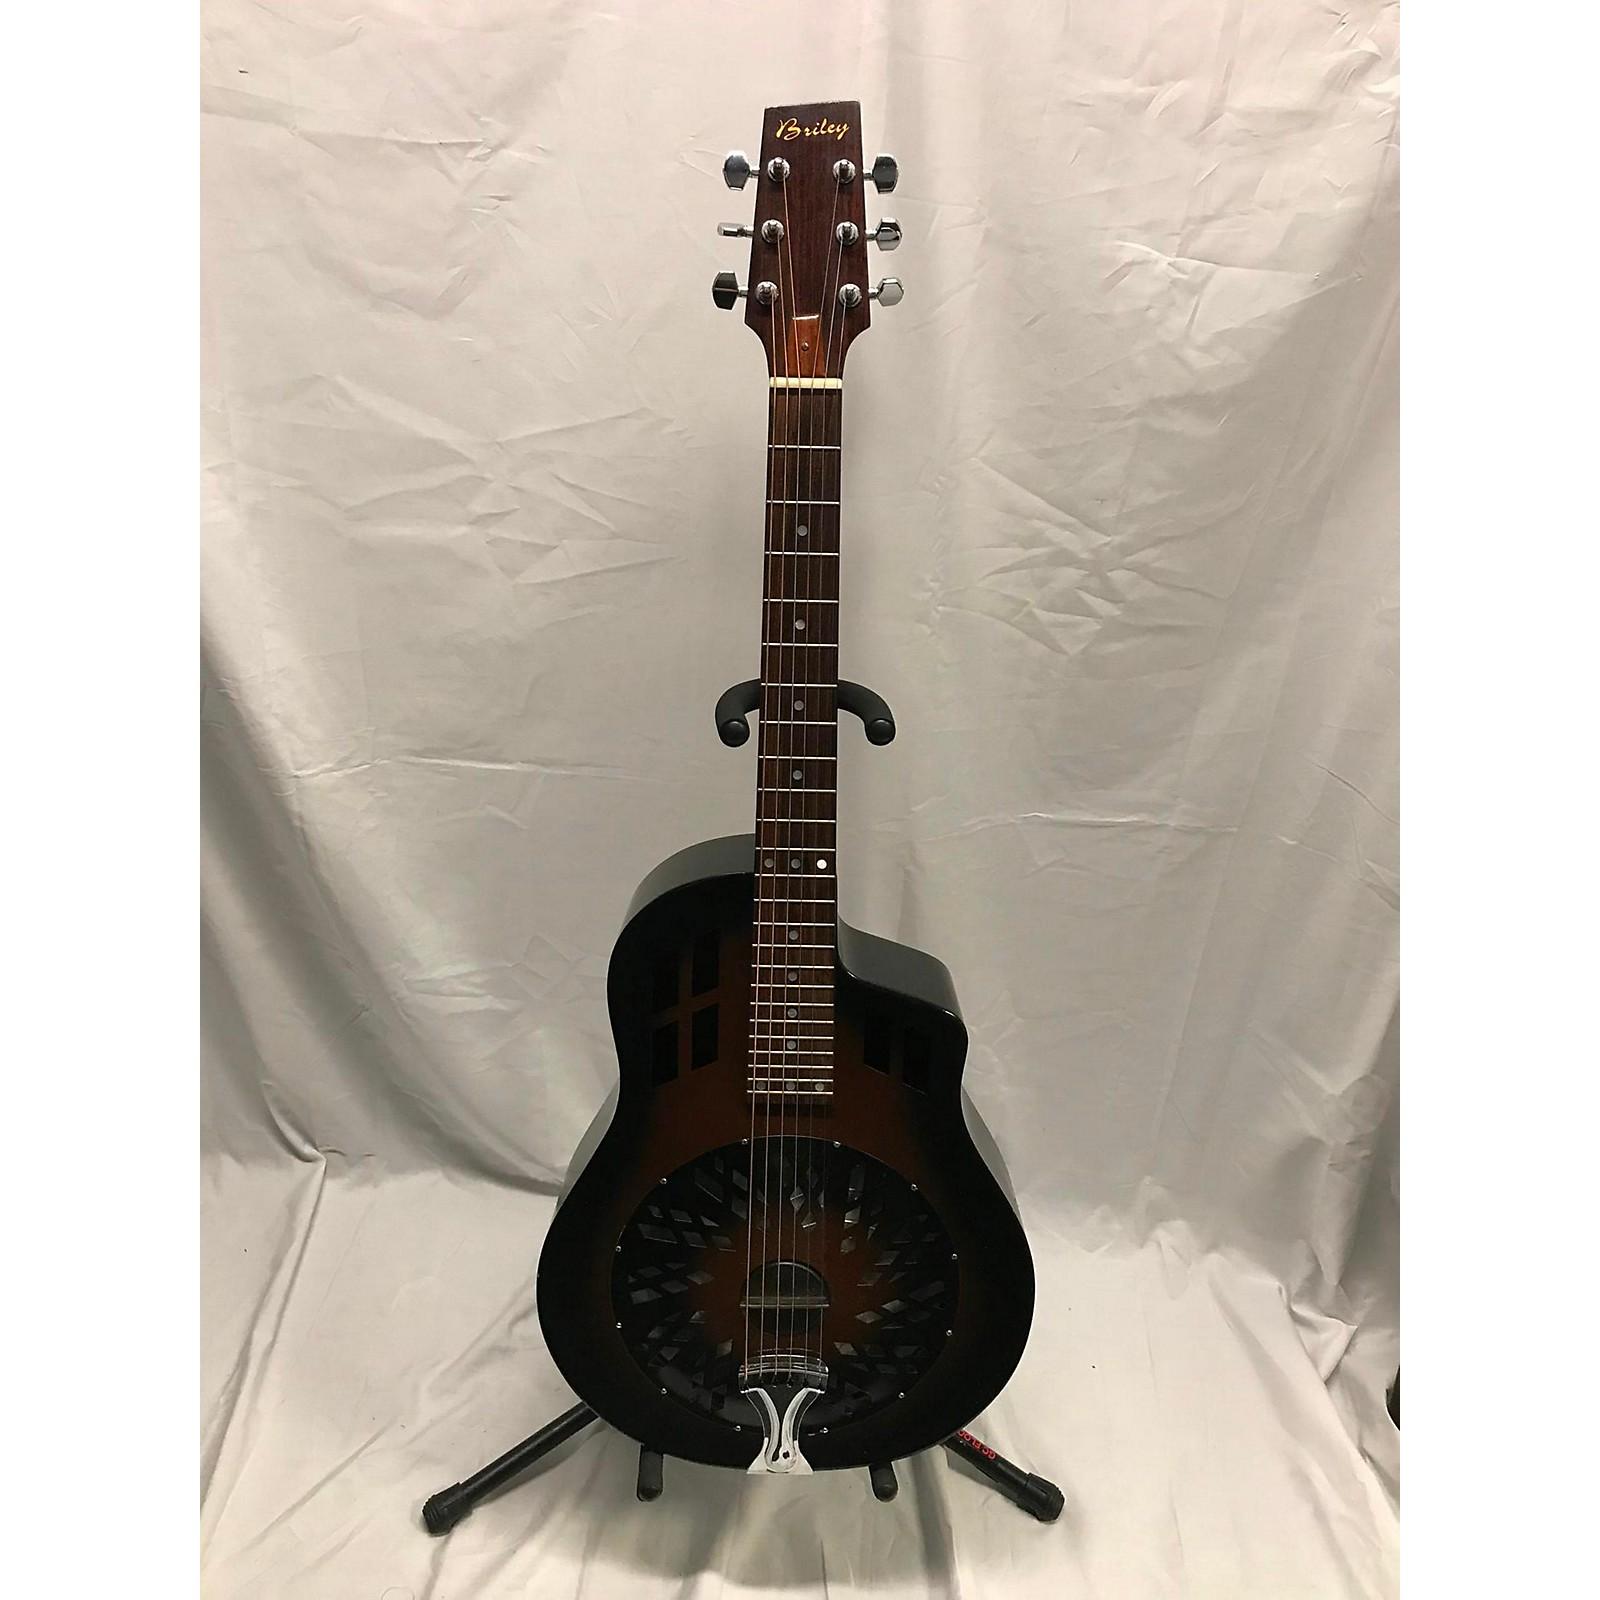 In Store Used Used Briley Resonator 2 Color Sunburst Resonator Guitar